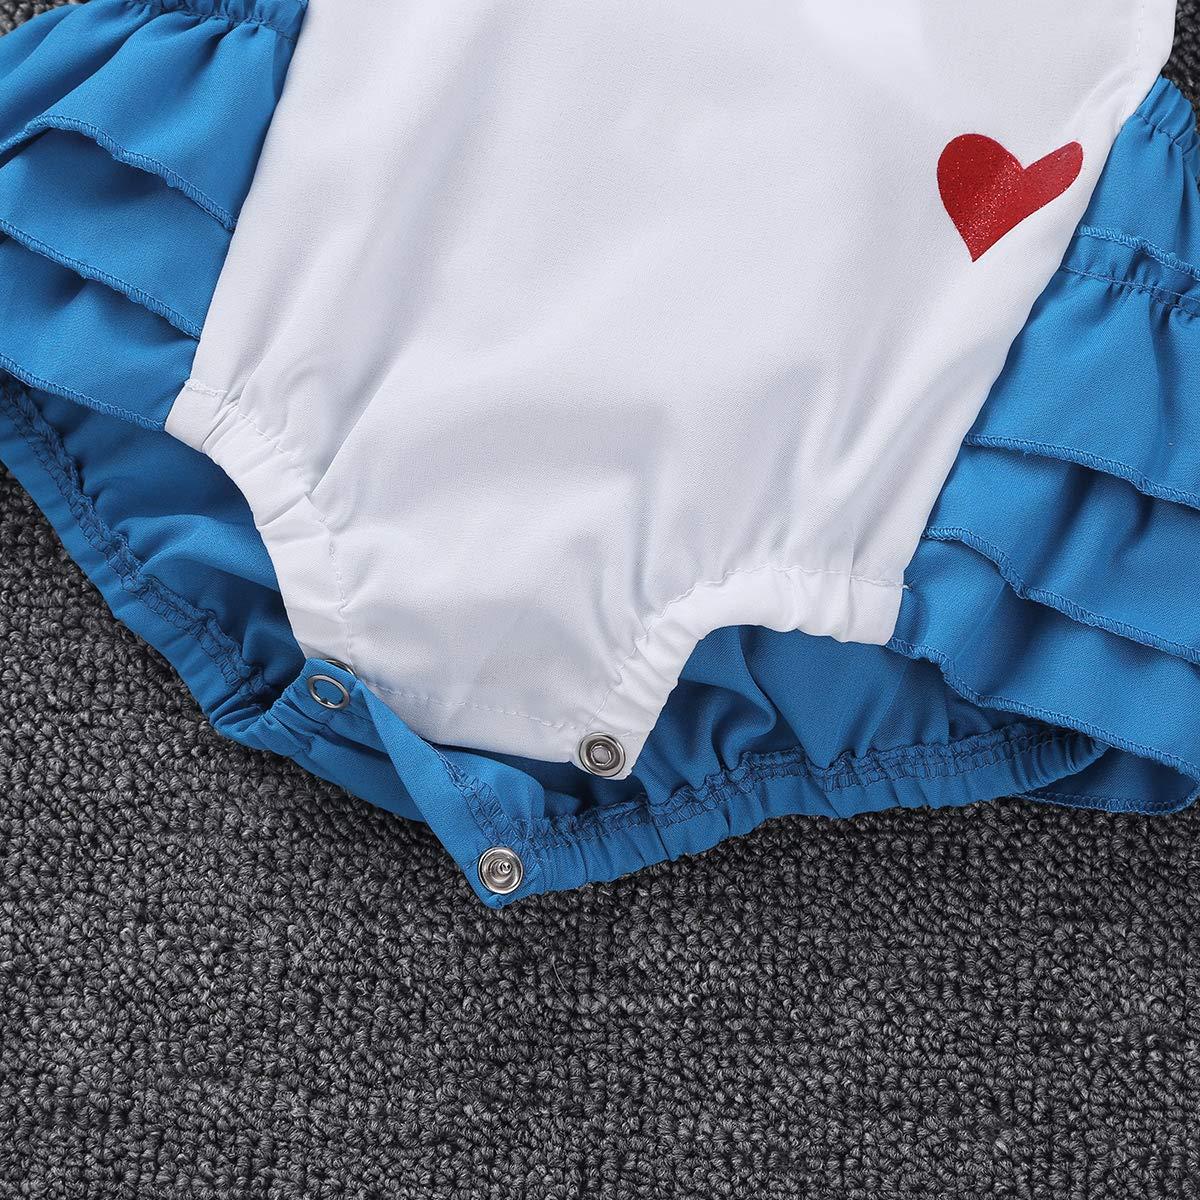 CHICTRY Wonderland Baby Girls Romper First Birthday Princess Cross-Back Tutu Ruffles Dresses Costumes